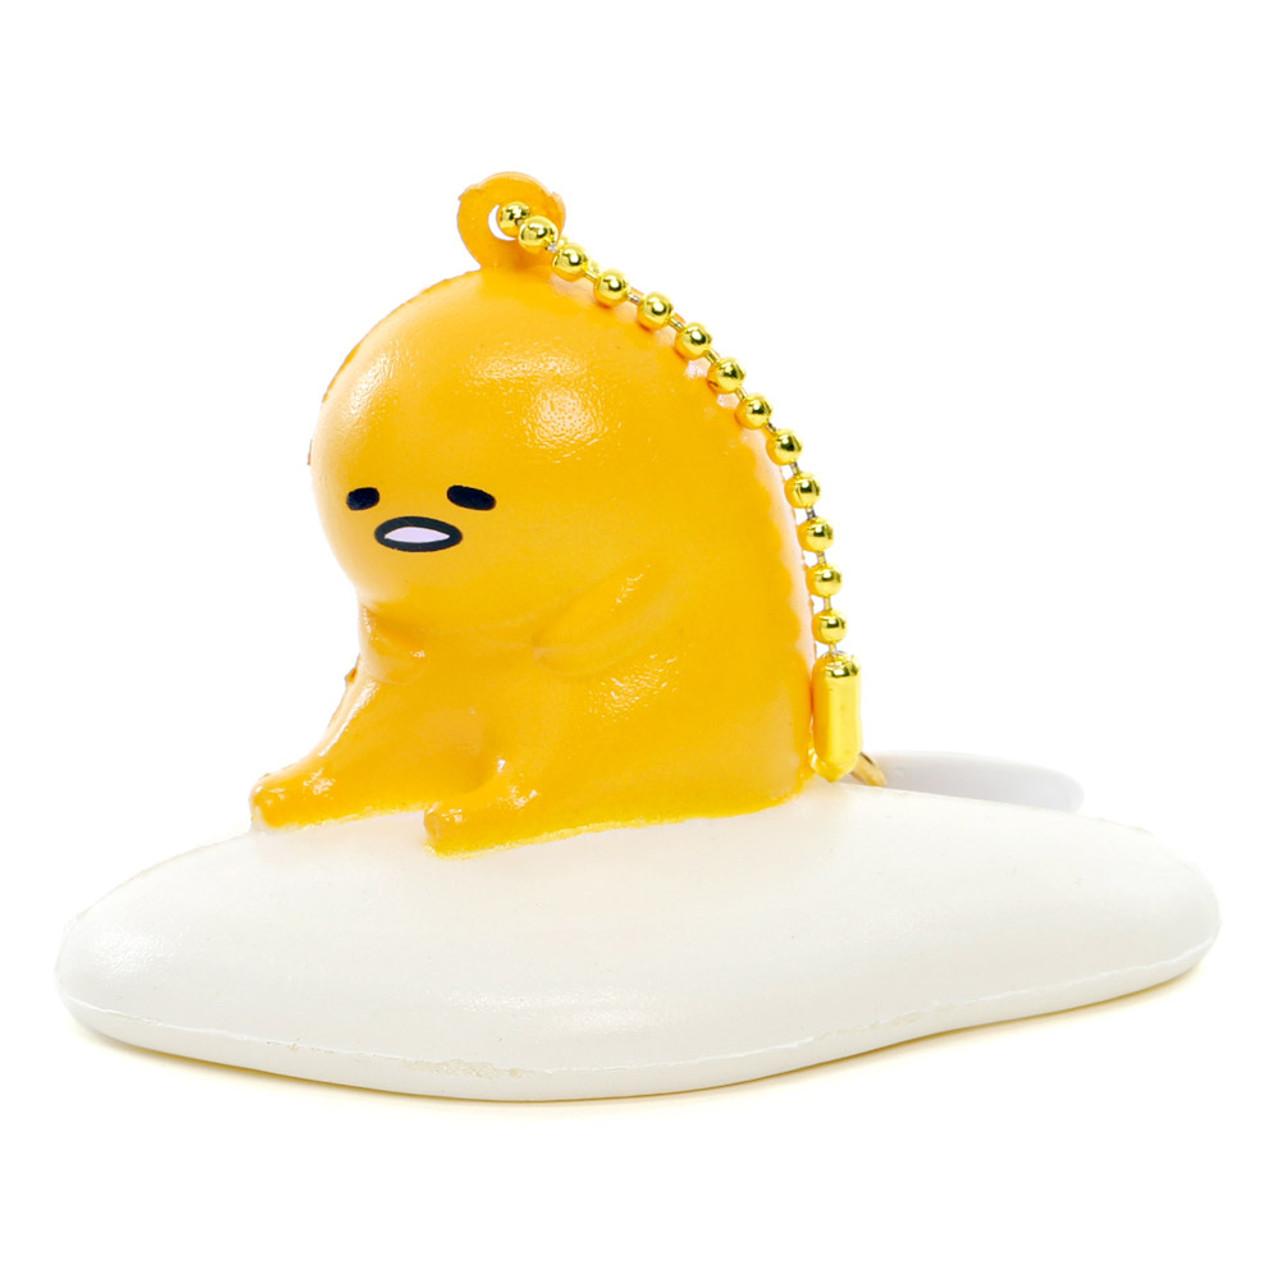 Sanrio Gudetama Lazy Egg Mascot Sitting Model Soft Squishy Charms Cellphone Charms ( Side View )